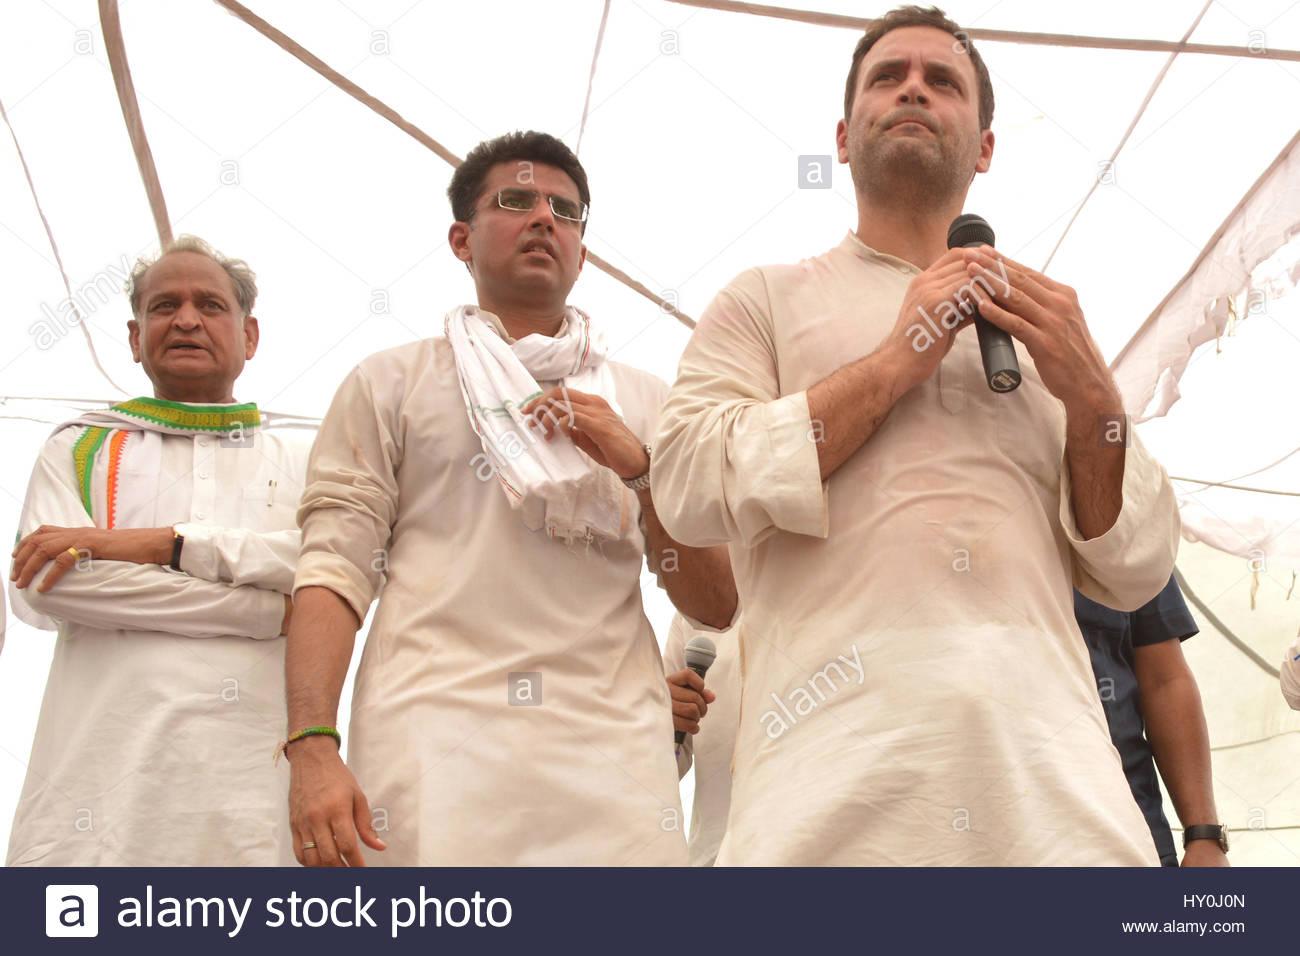 Post Punjab, Rajasthan and Chhattisgarh offer similar challenge for Congress